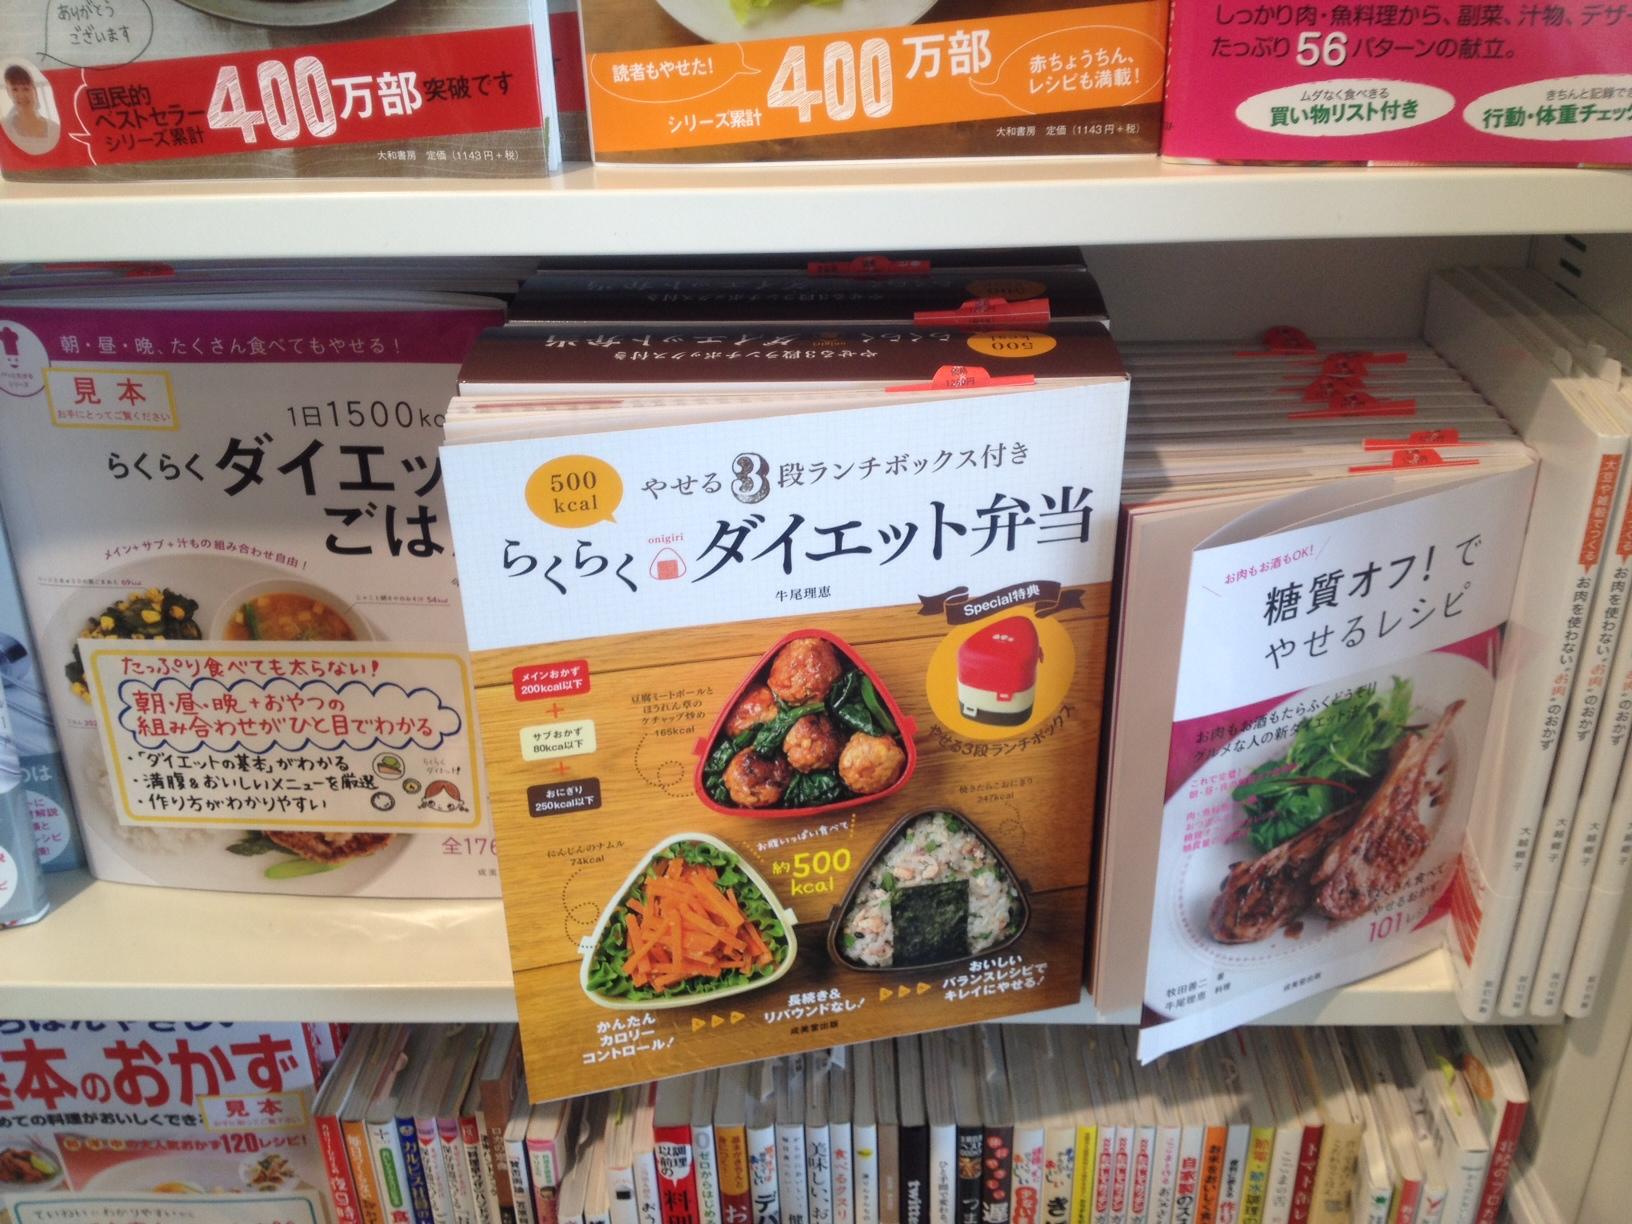 http://sorakikaku.com/maruyamamiki/files/0319-2.JPG